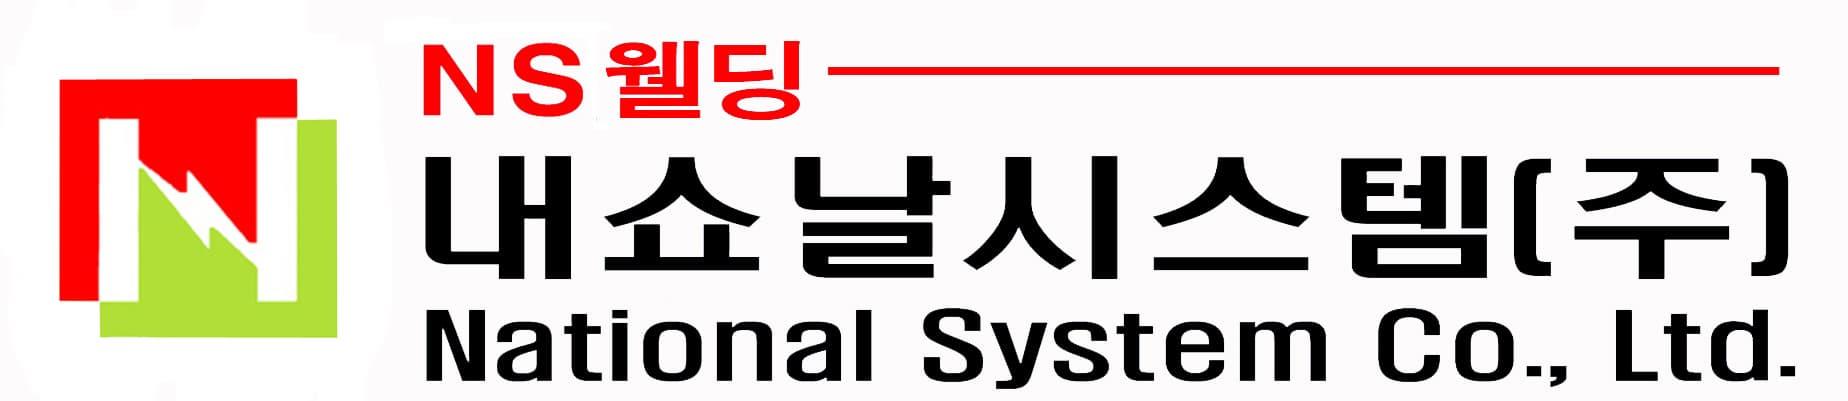 National System Co.,Ltd.